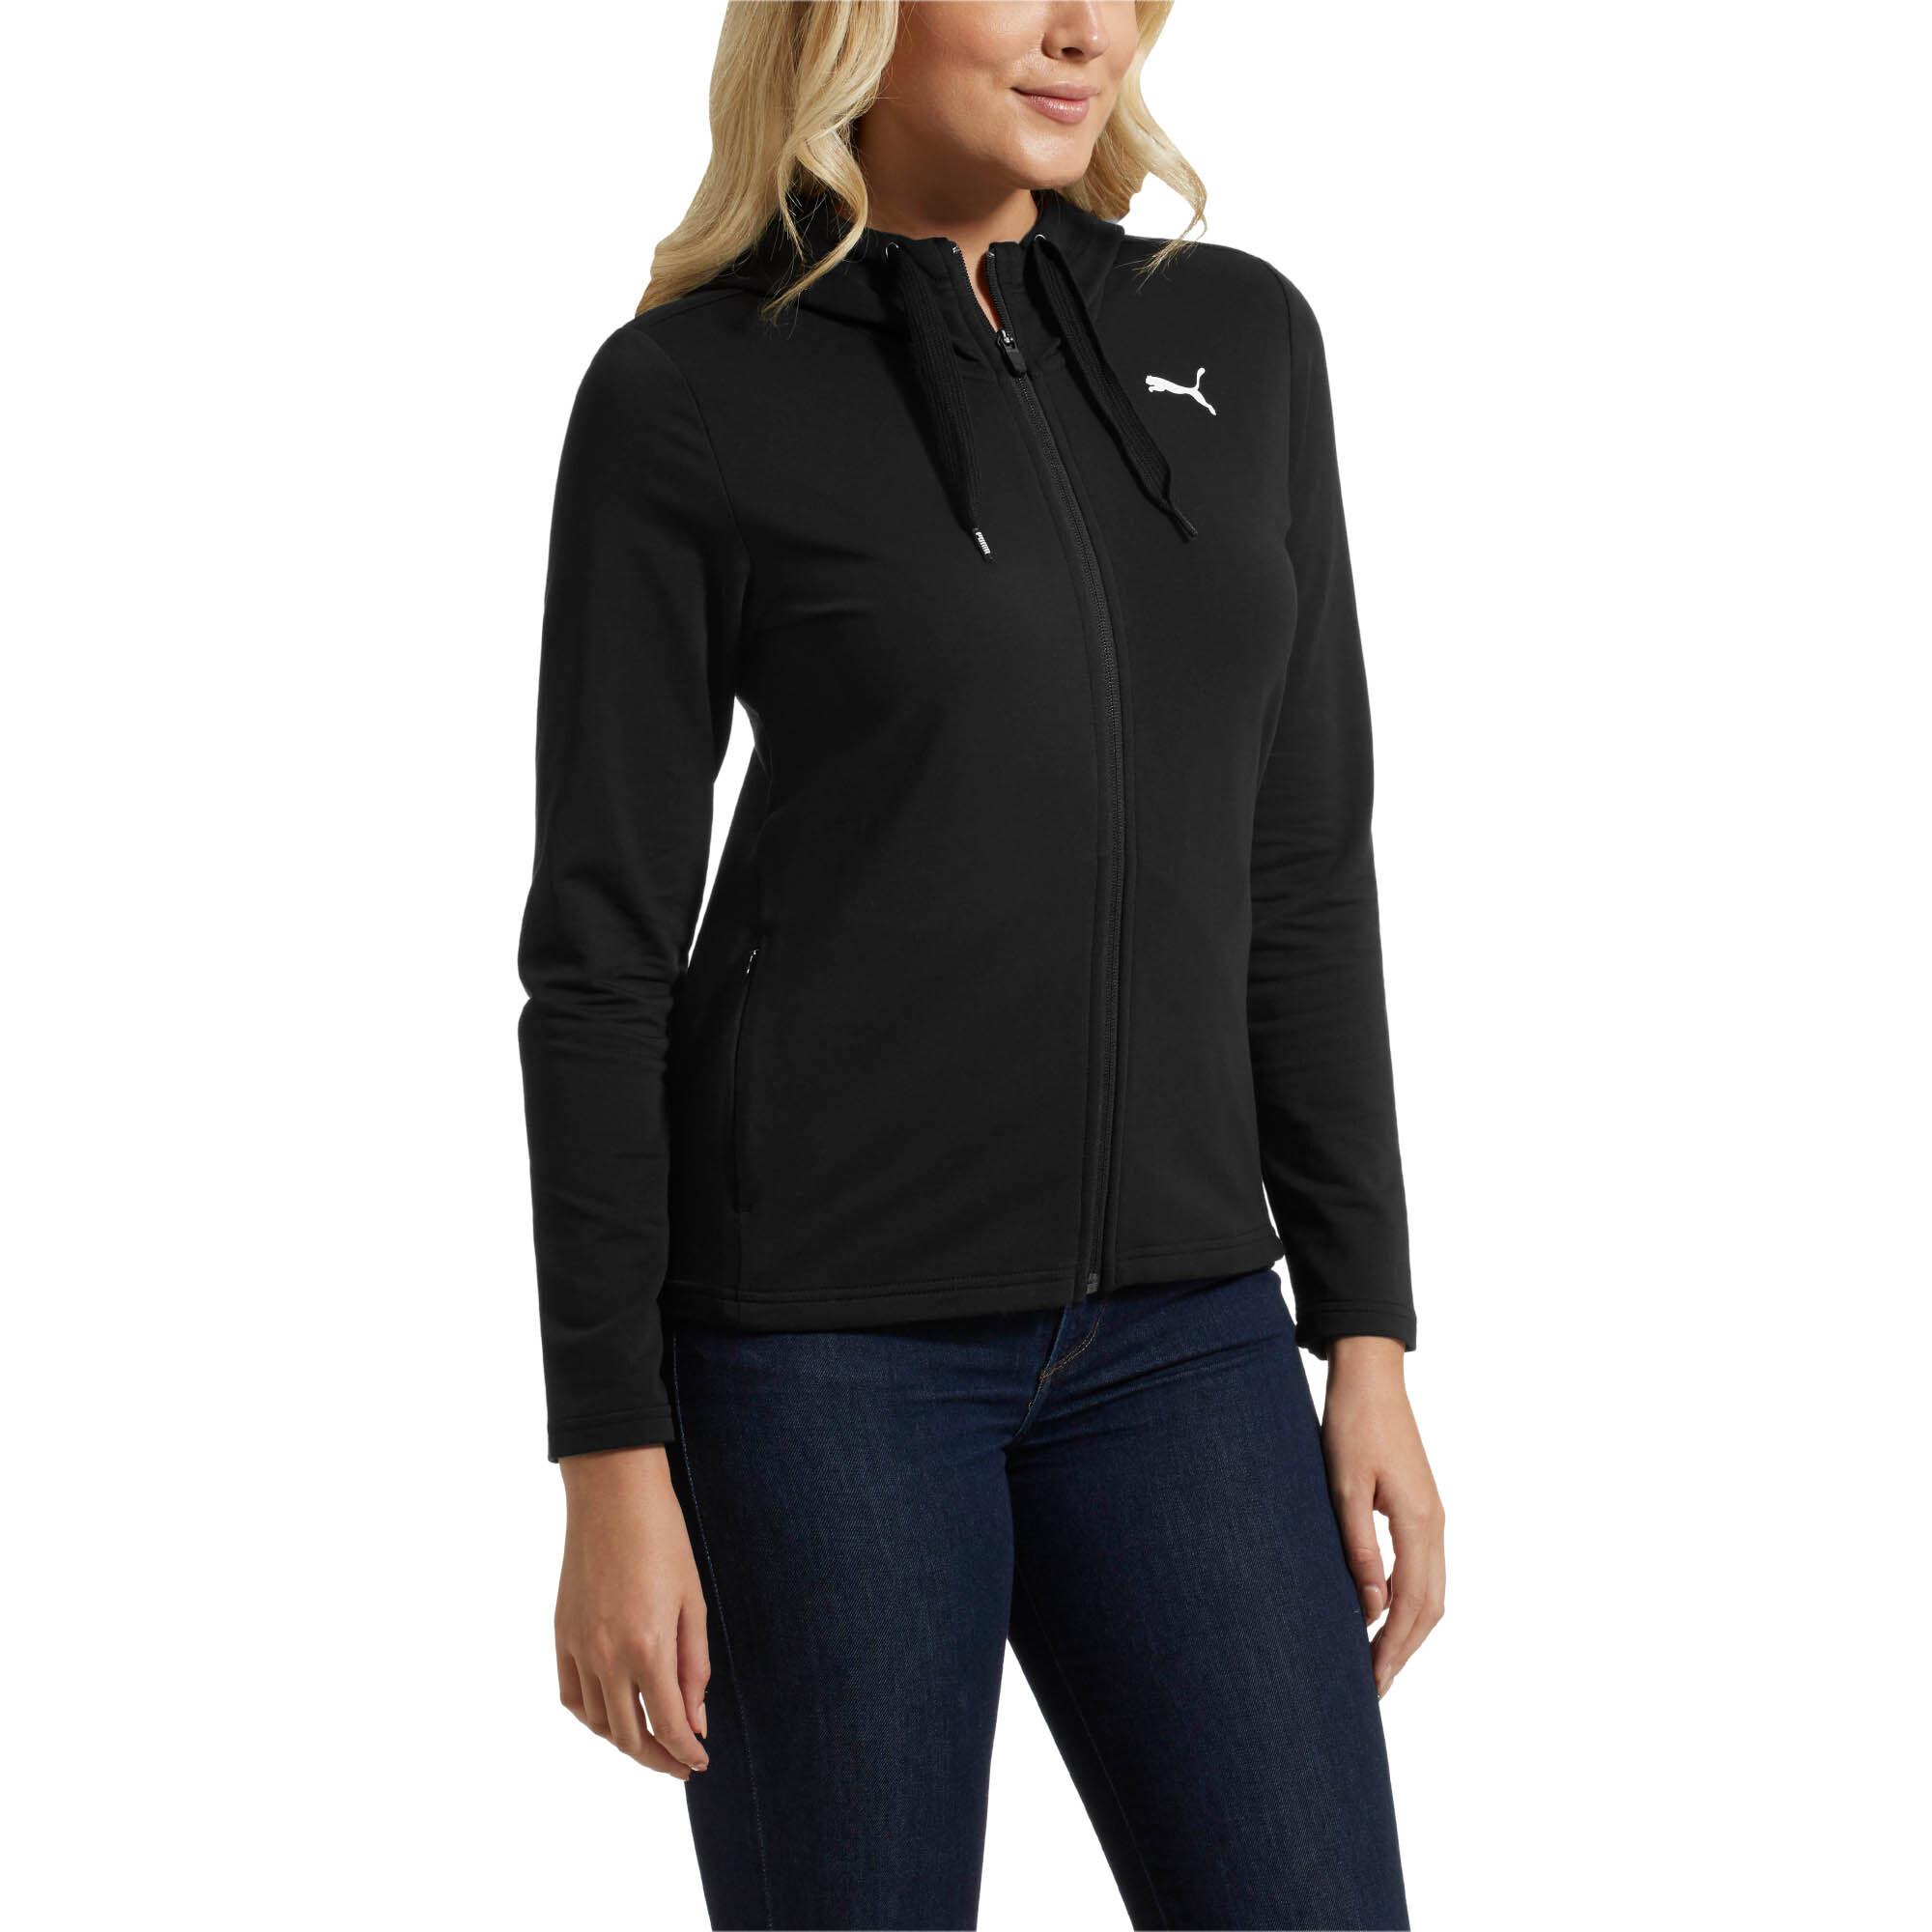 PUMA-Women-039-s-Modern-Sport-Full-Zip-Hoodie thumbnail 4